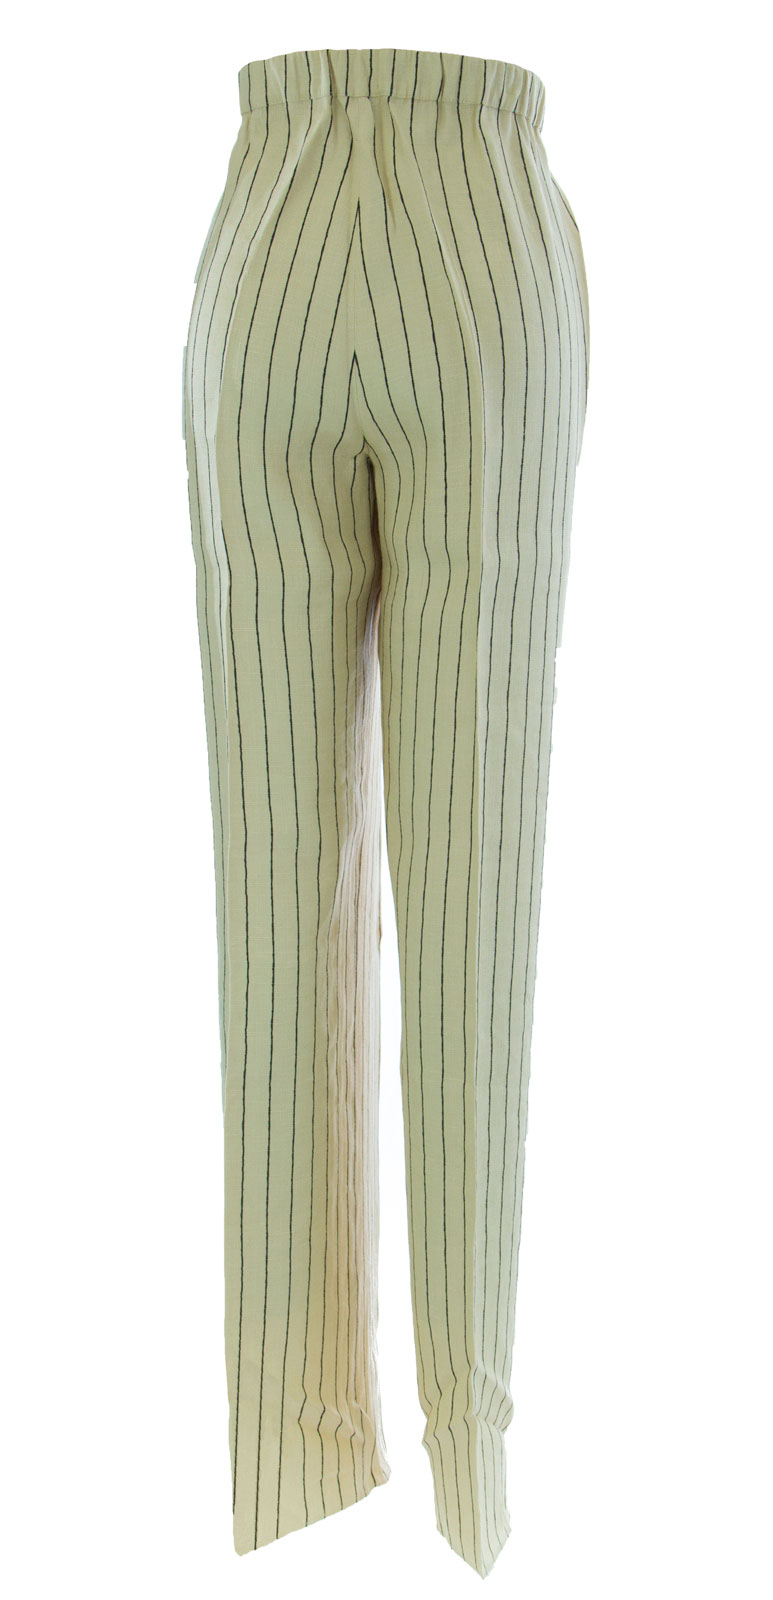 By à rayures Rinaldi de 437 costume la crème Marina et Pantalon à fines Nwt Maxmara 5YIwg